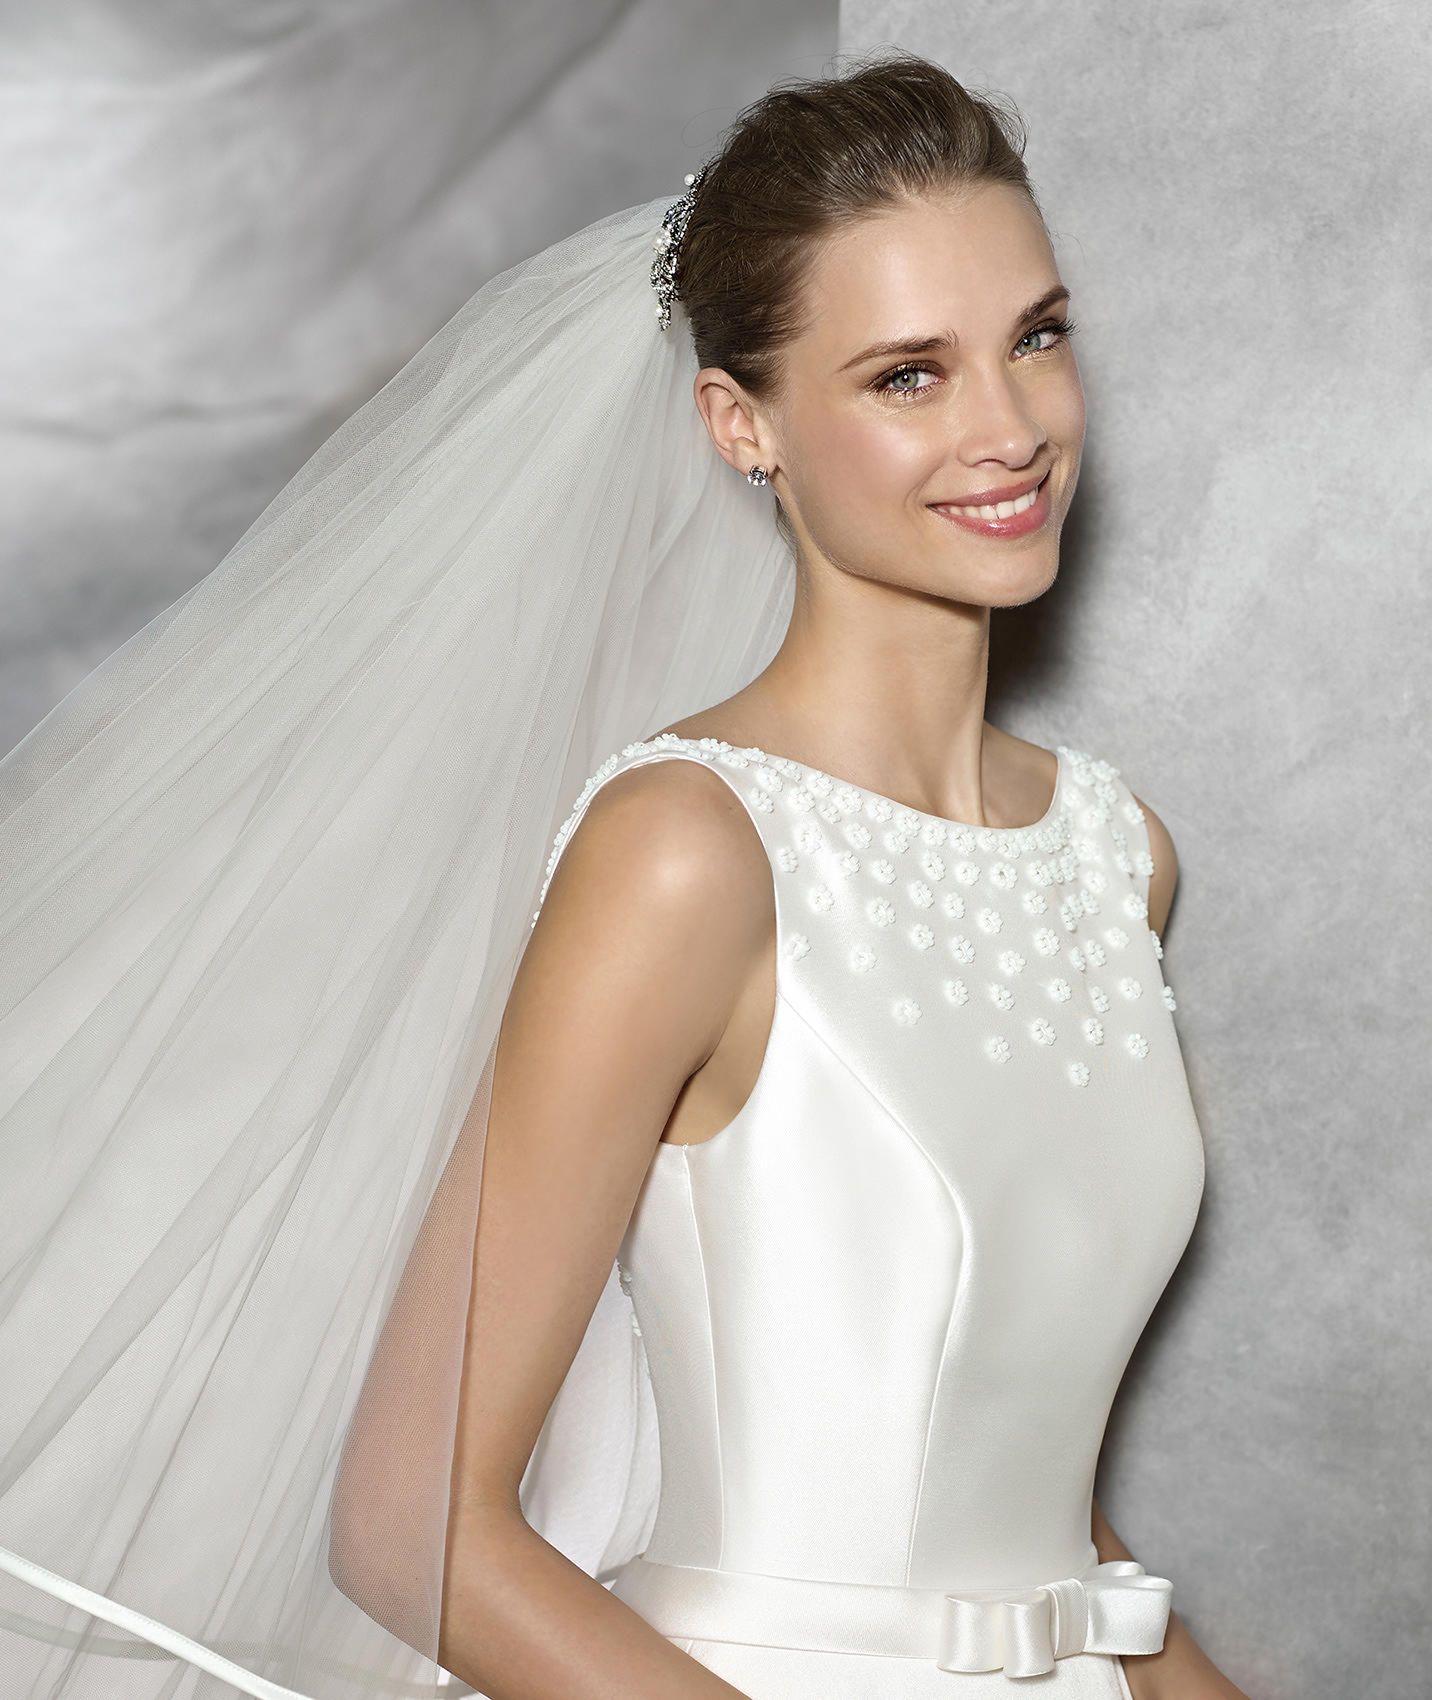 TRESIA - Modernes Brautkleid im Prinzessin-Stil | Wedding dress ...